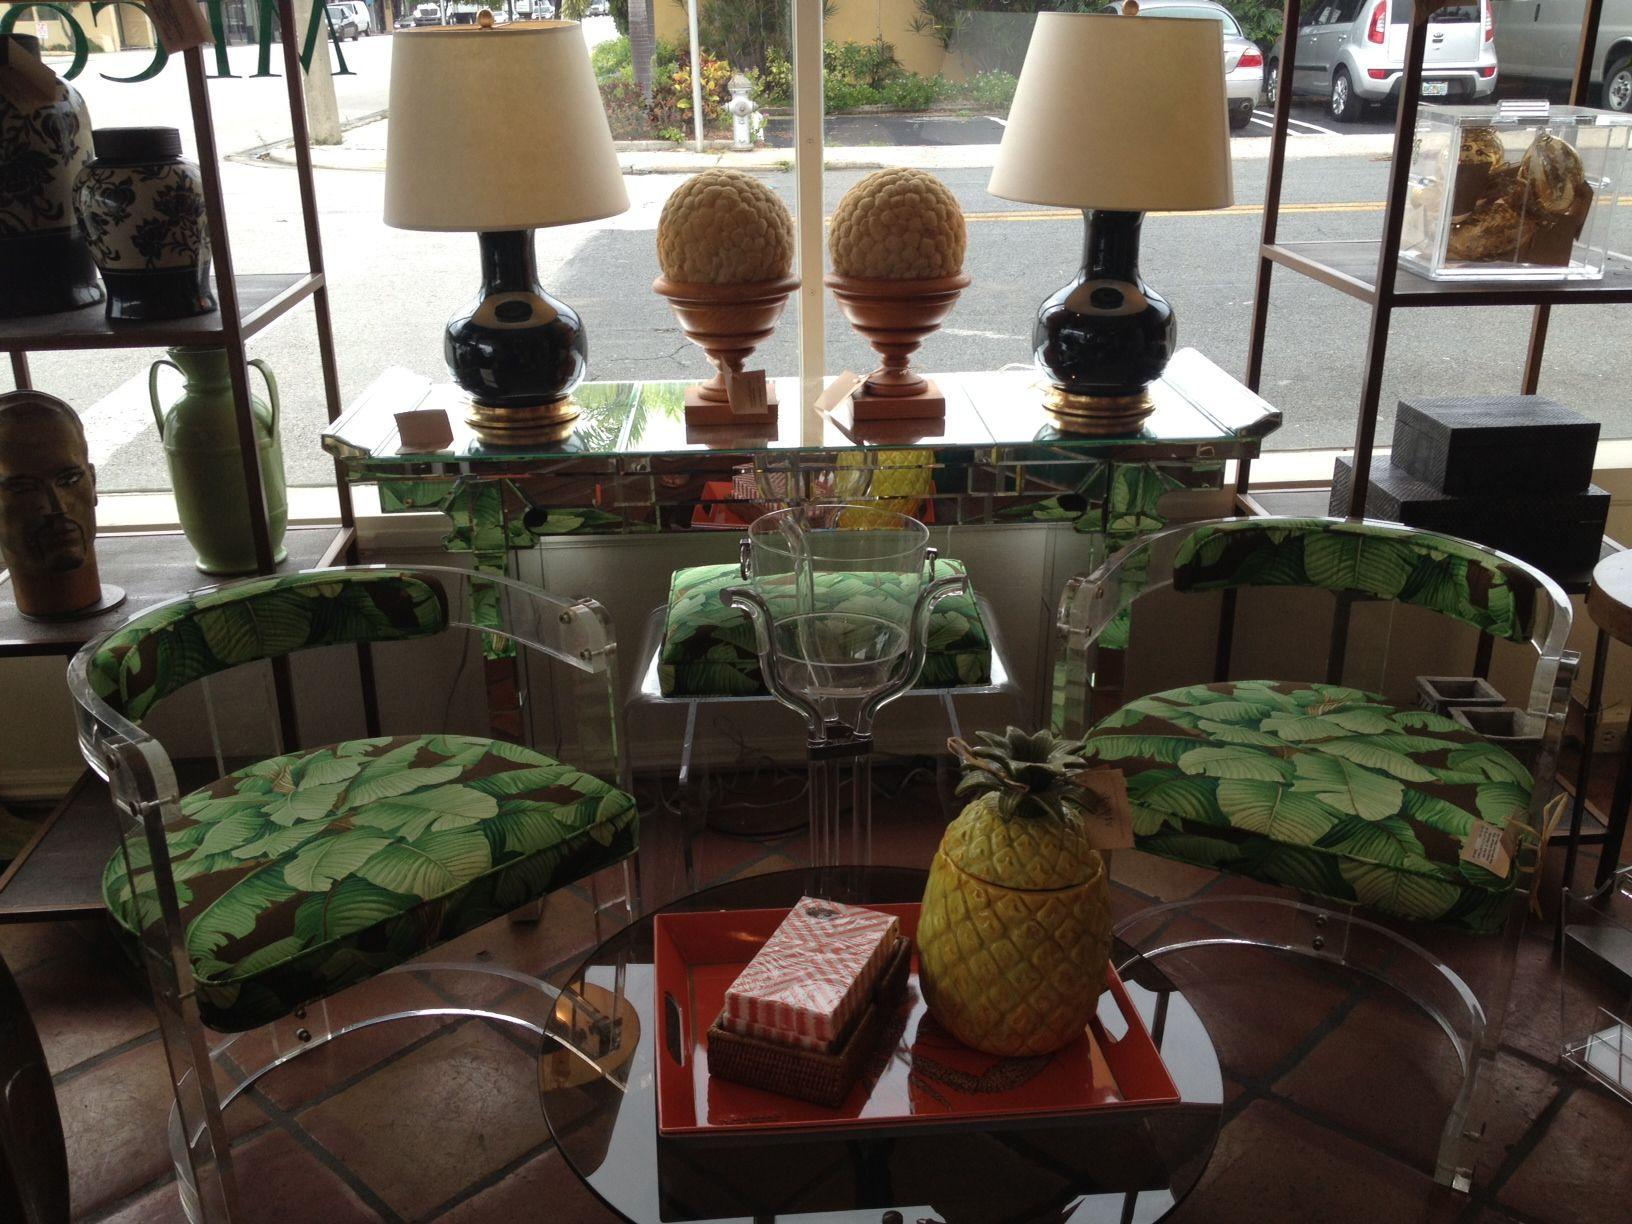 #colorful #mecox #palmbeach  #mecoxgardens #decor #home #homedecor #design #interiordesign #christopherspitzmiller #lamps #lucite #vintage